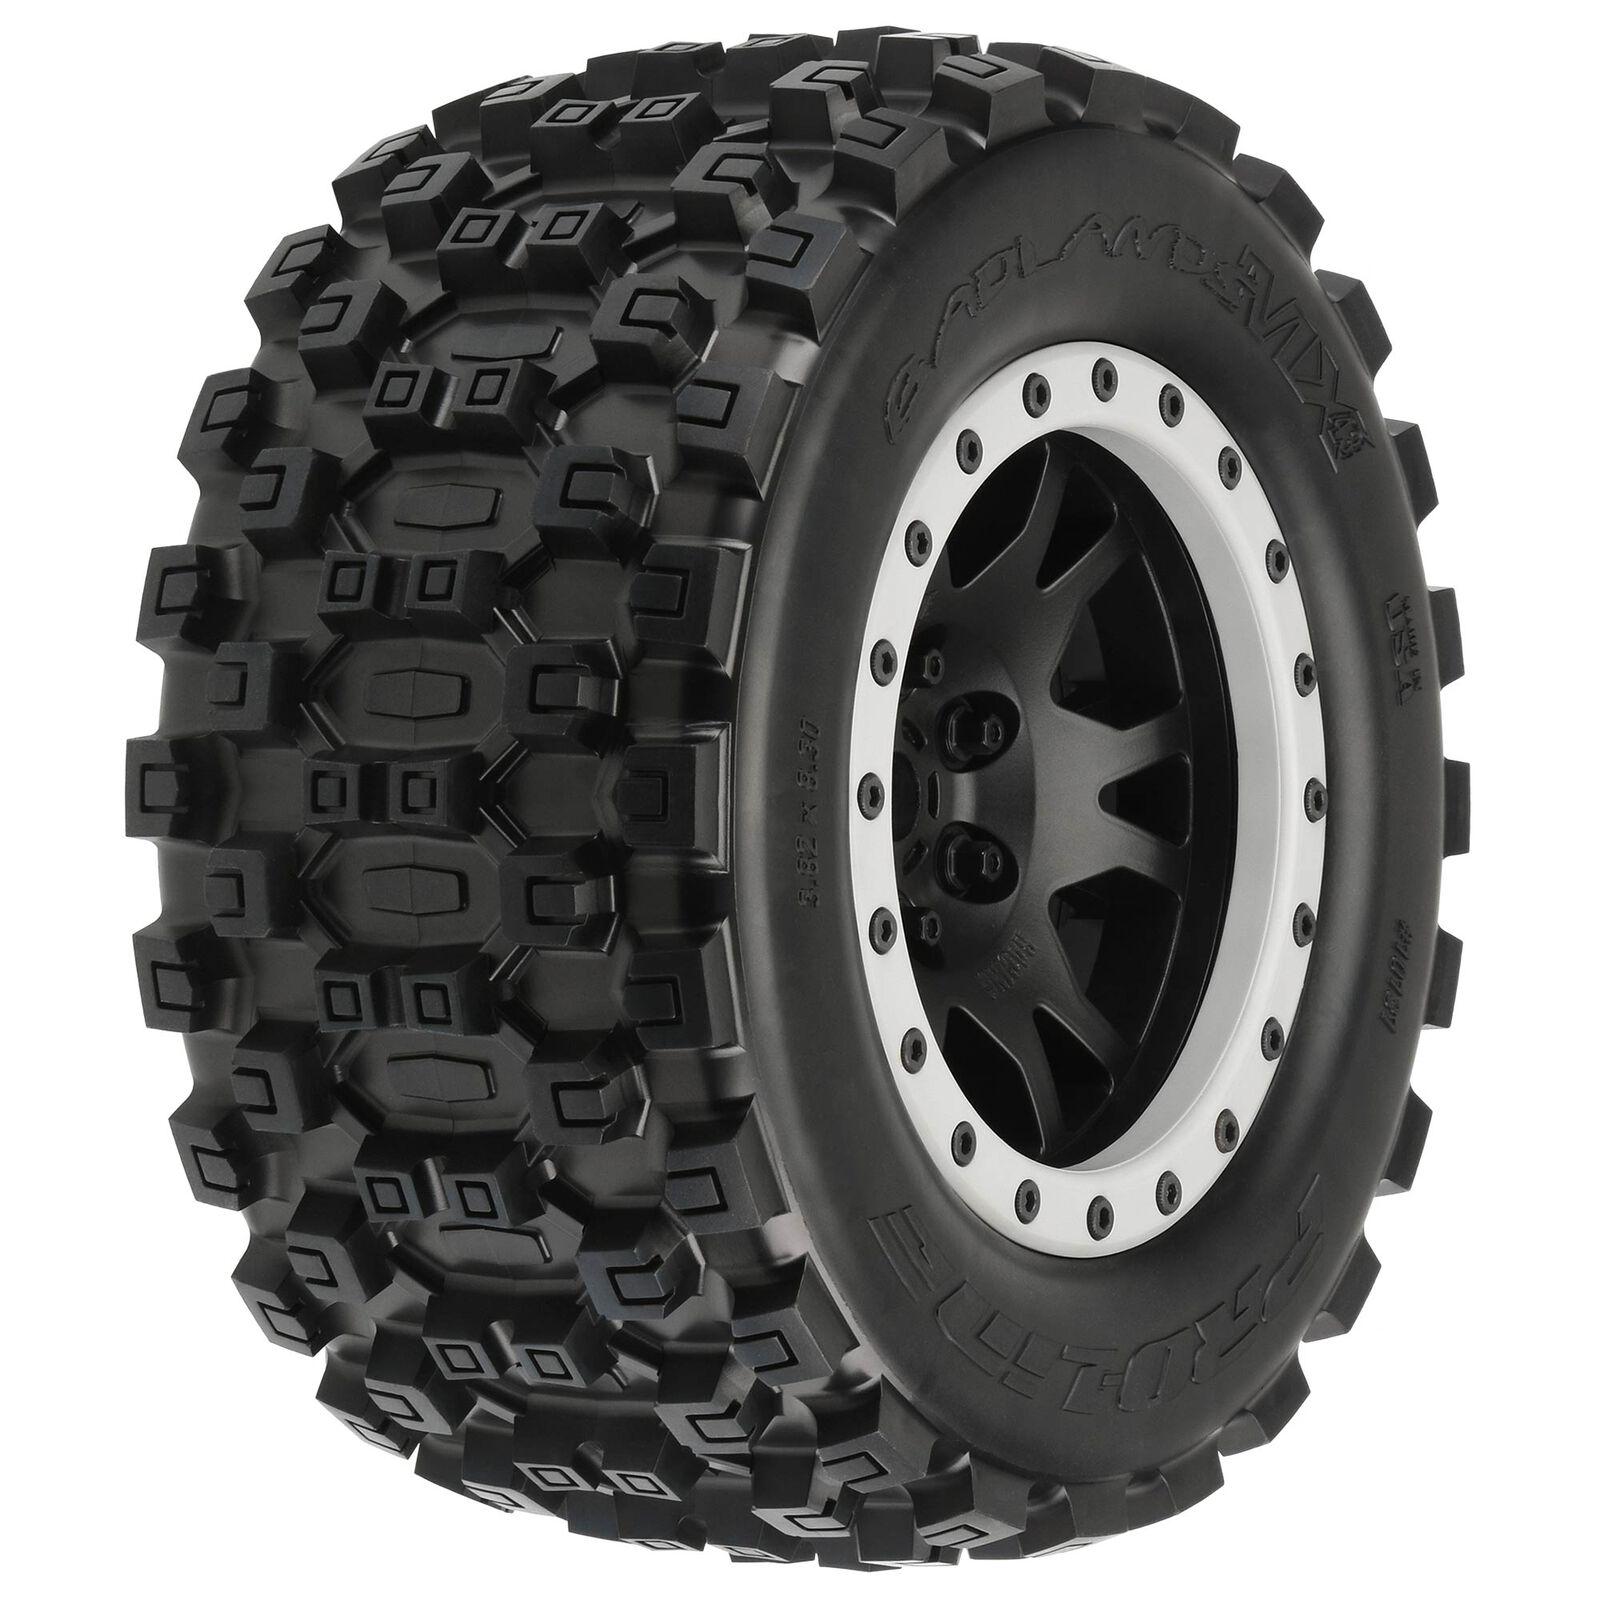 Badlands MX43 Pro-Loc Mounted, Impulse Black Wheels with Grey Rings (2): X-Maxx